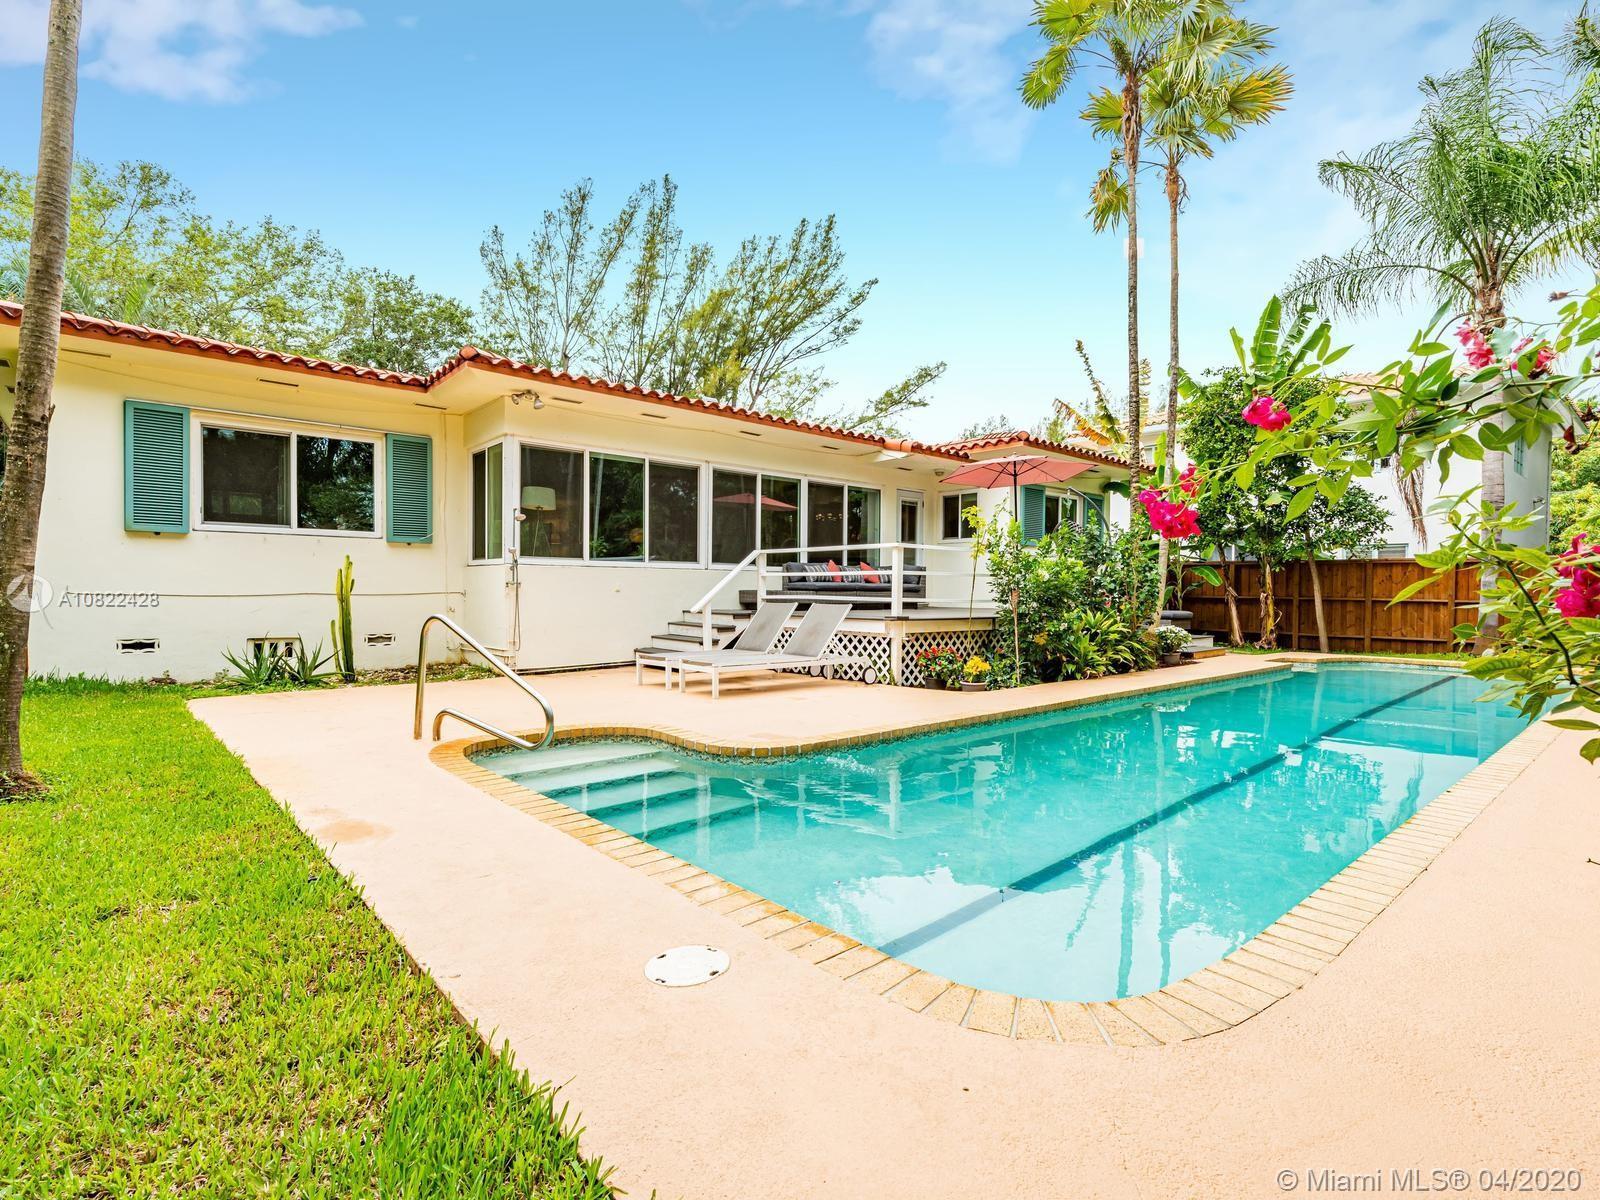 711 NE 118 St, Miami Shores, Florida